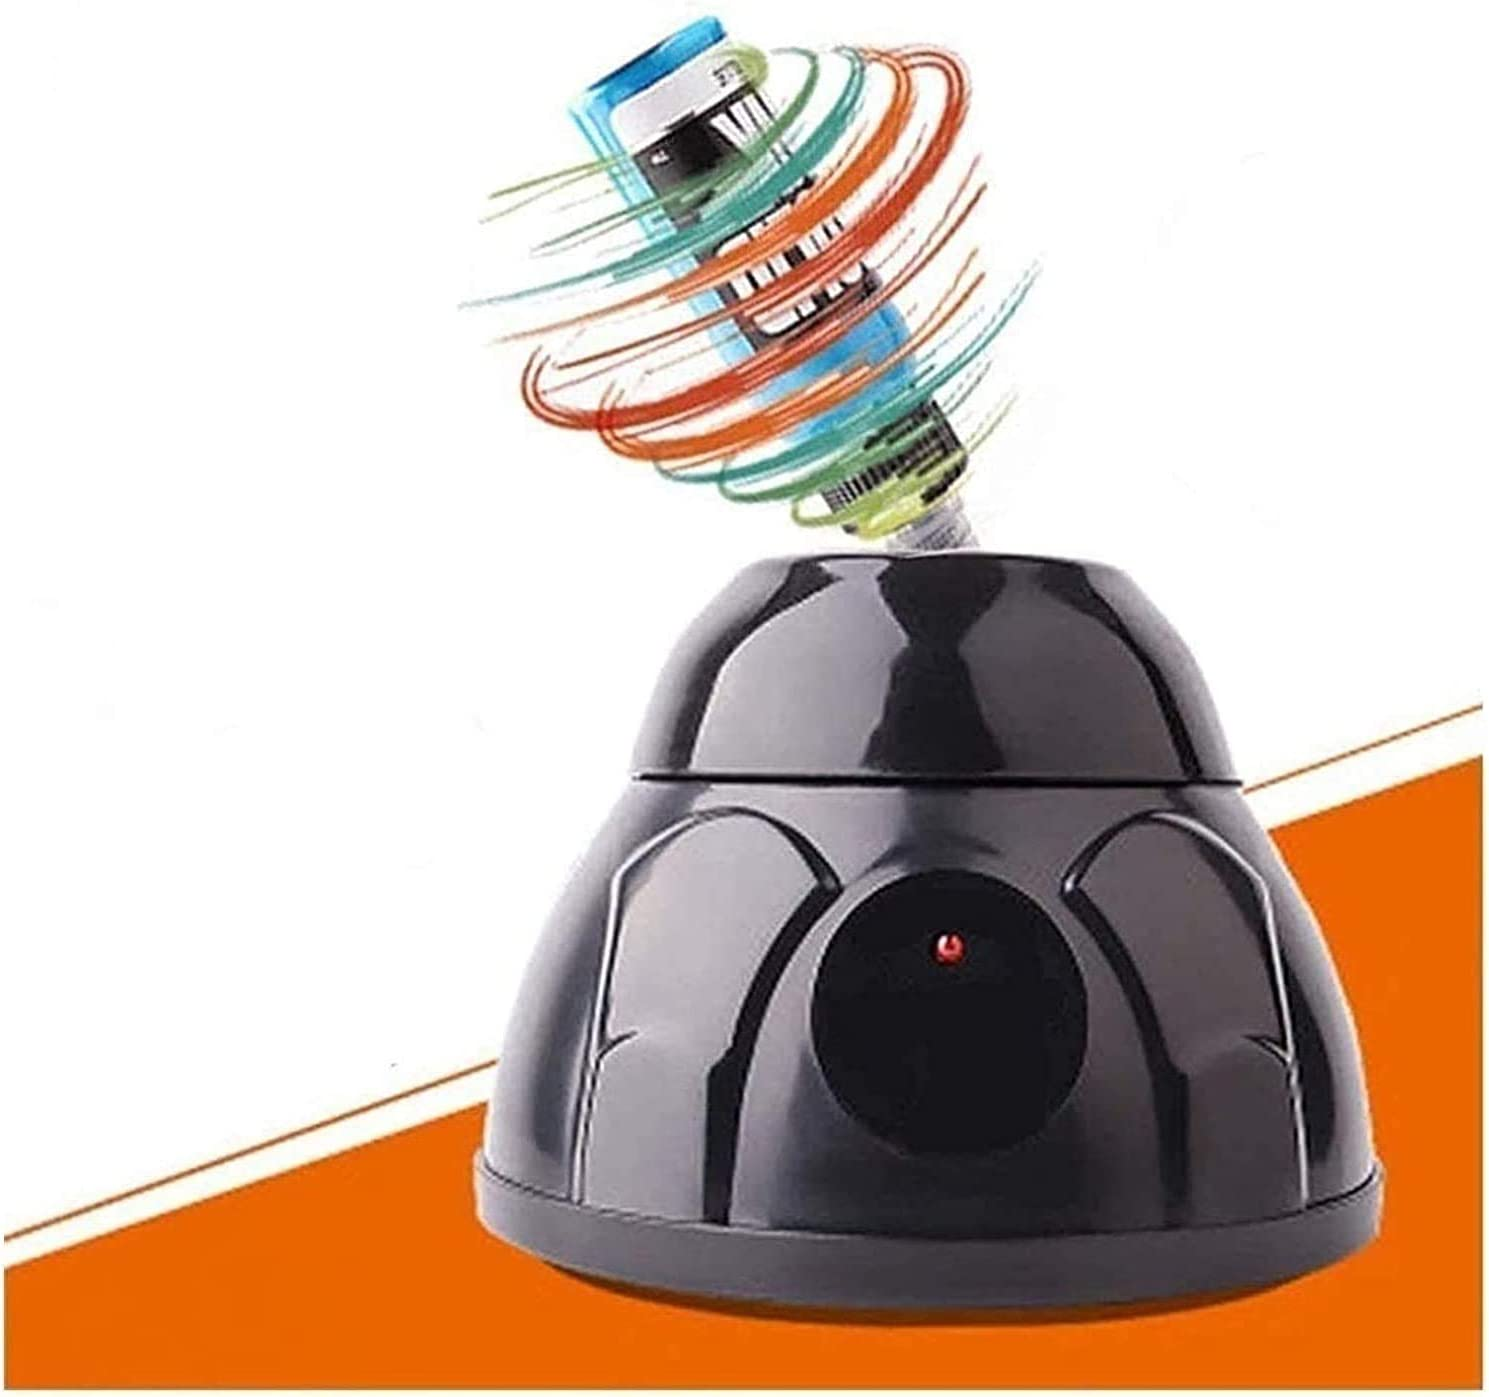 QDY -Mini Vortex El Paso Mall Mixer Powerful 5200 RPM Touch Columbus Mall Lab Mi Mode Paint